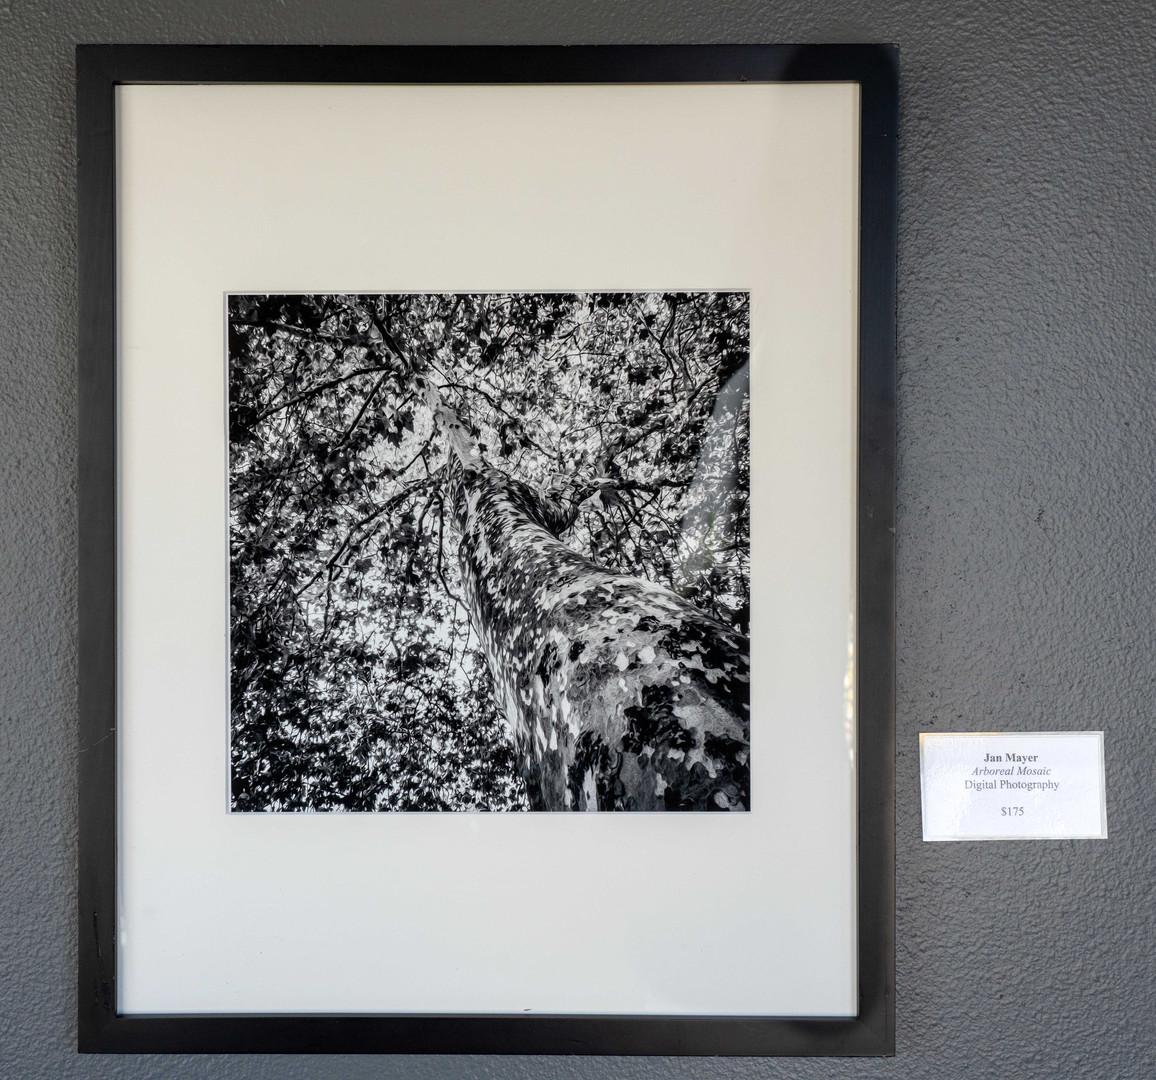 Jan-Mayer-Arboreal-Mosaic.jpg